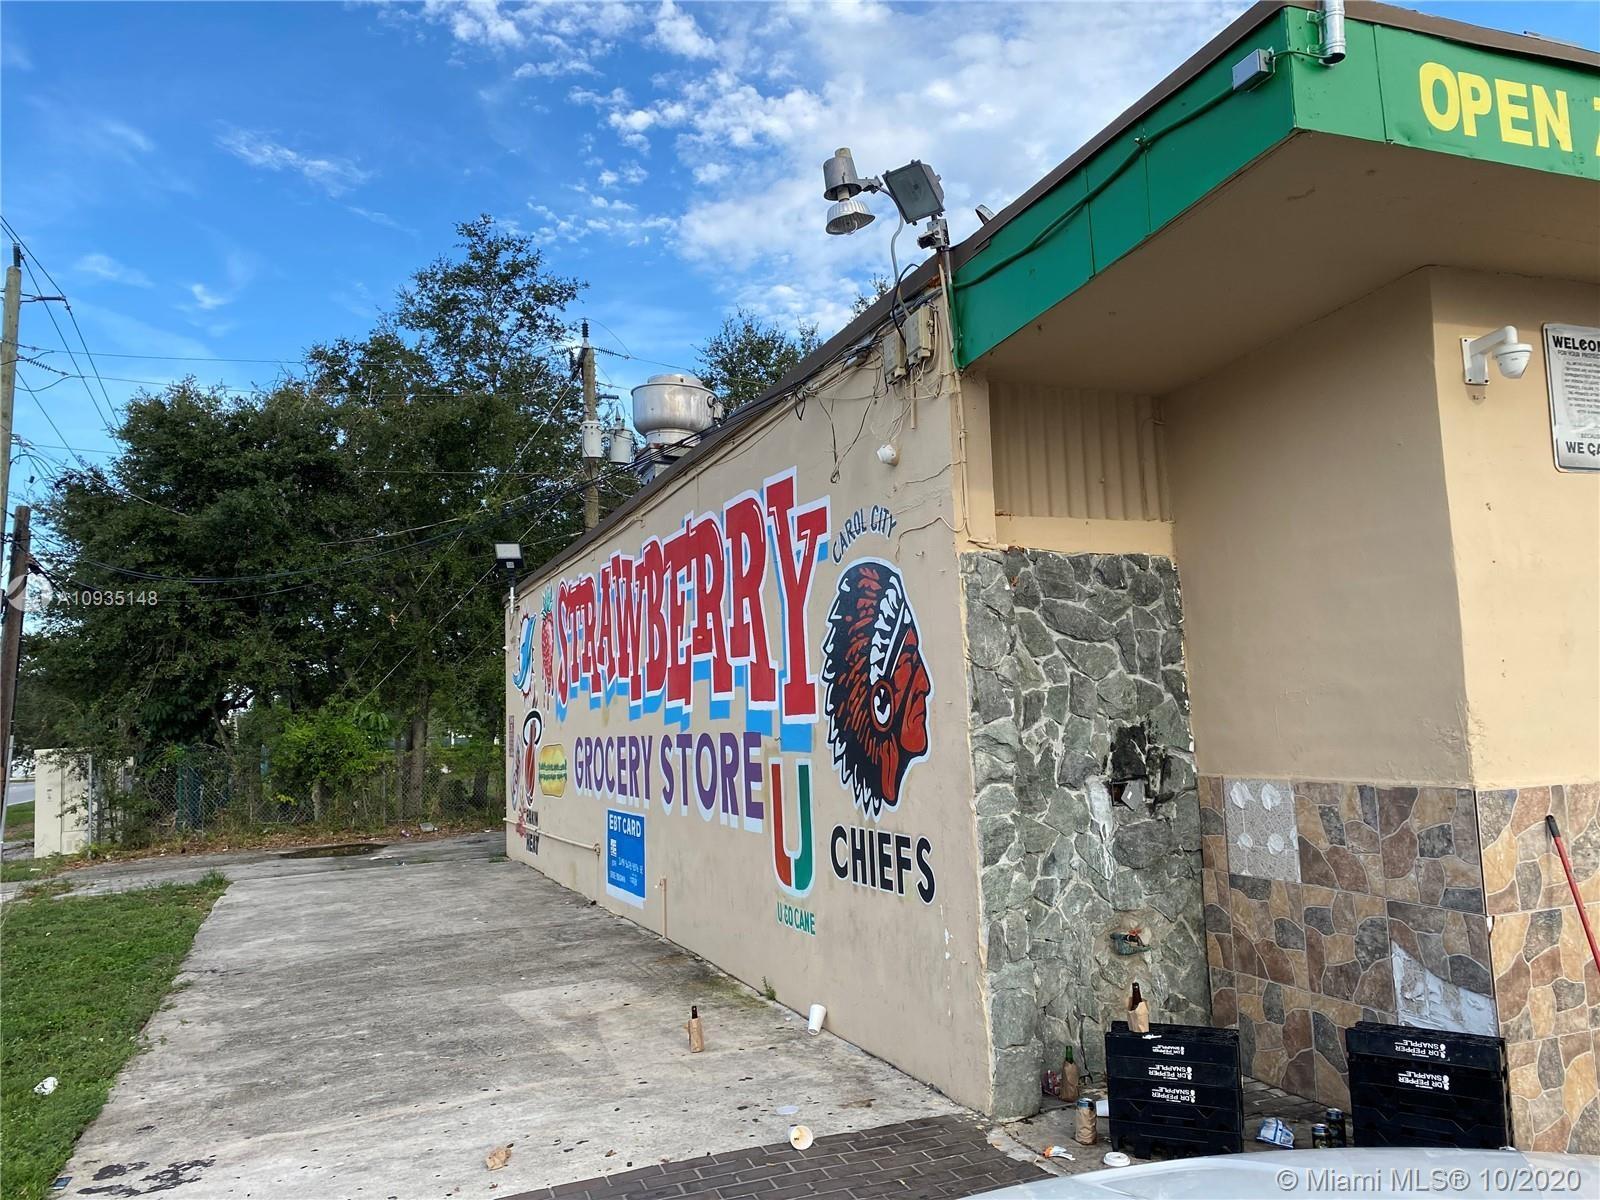 NW UNDISCLOSED, Miami Gardens, FL 33056